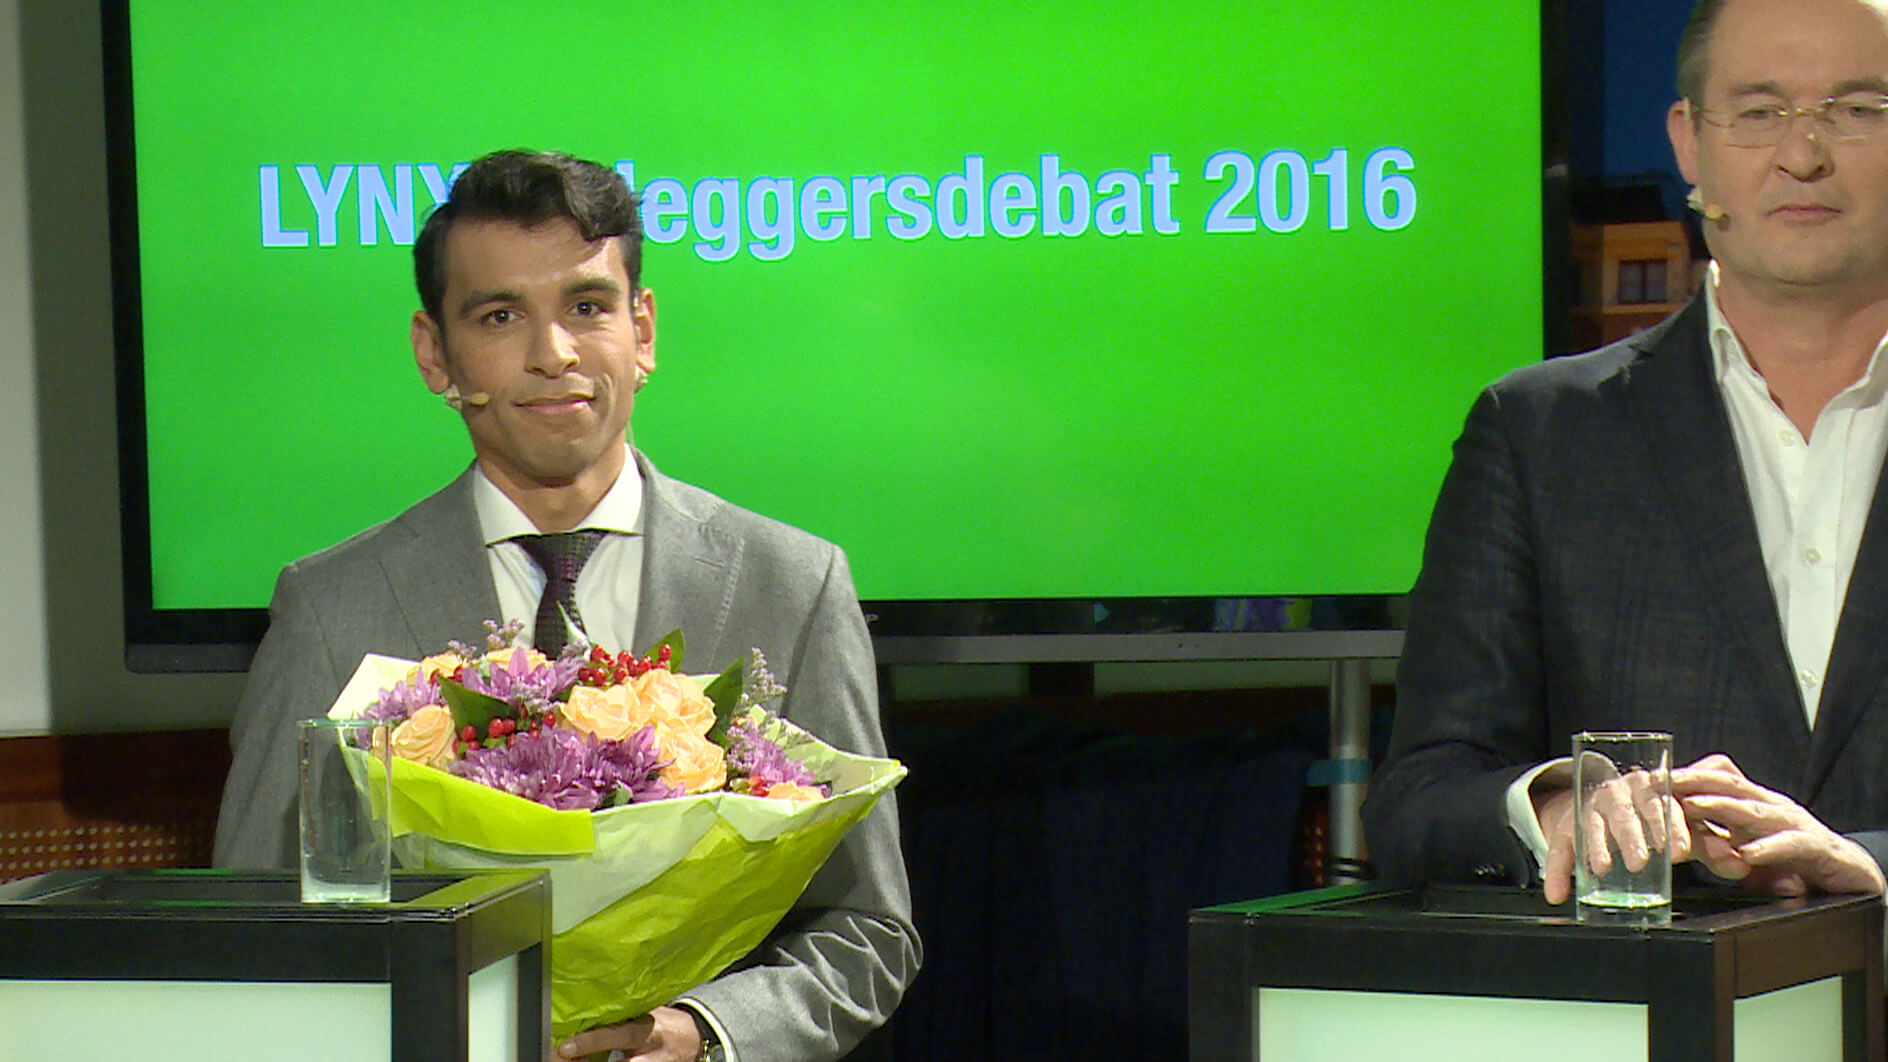 Jim winnaar LYNX Beleggersdebat 2016